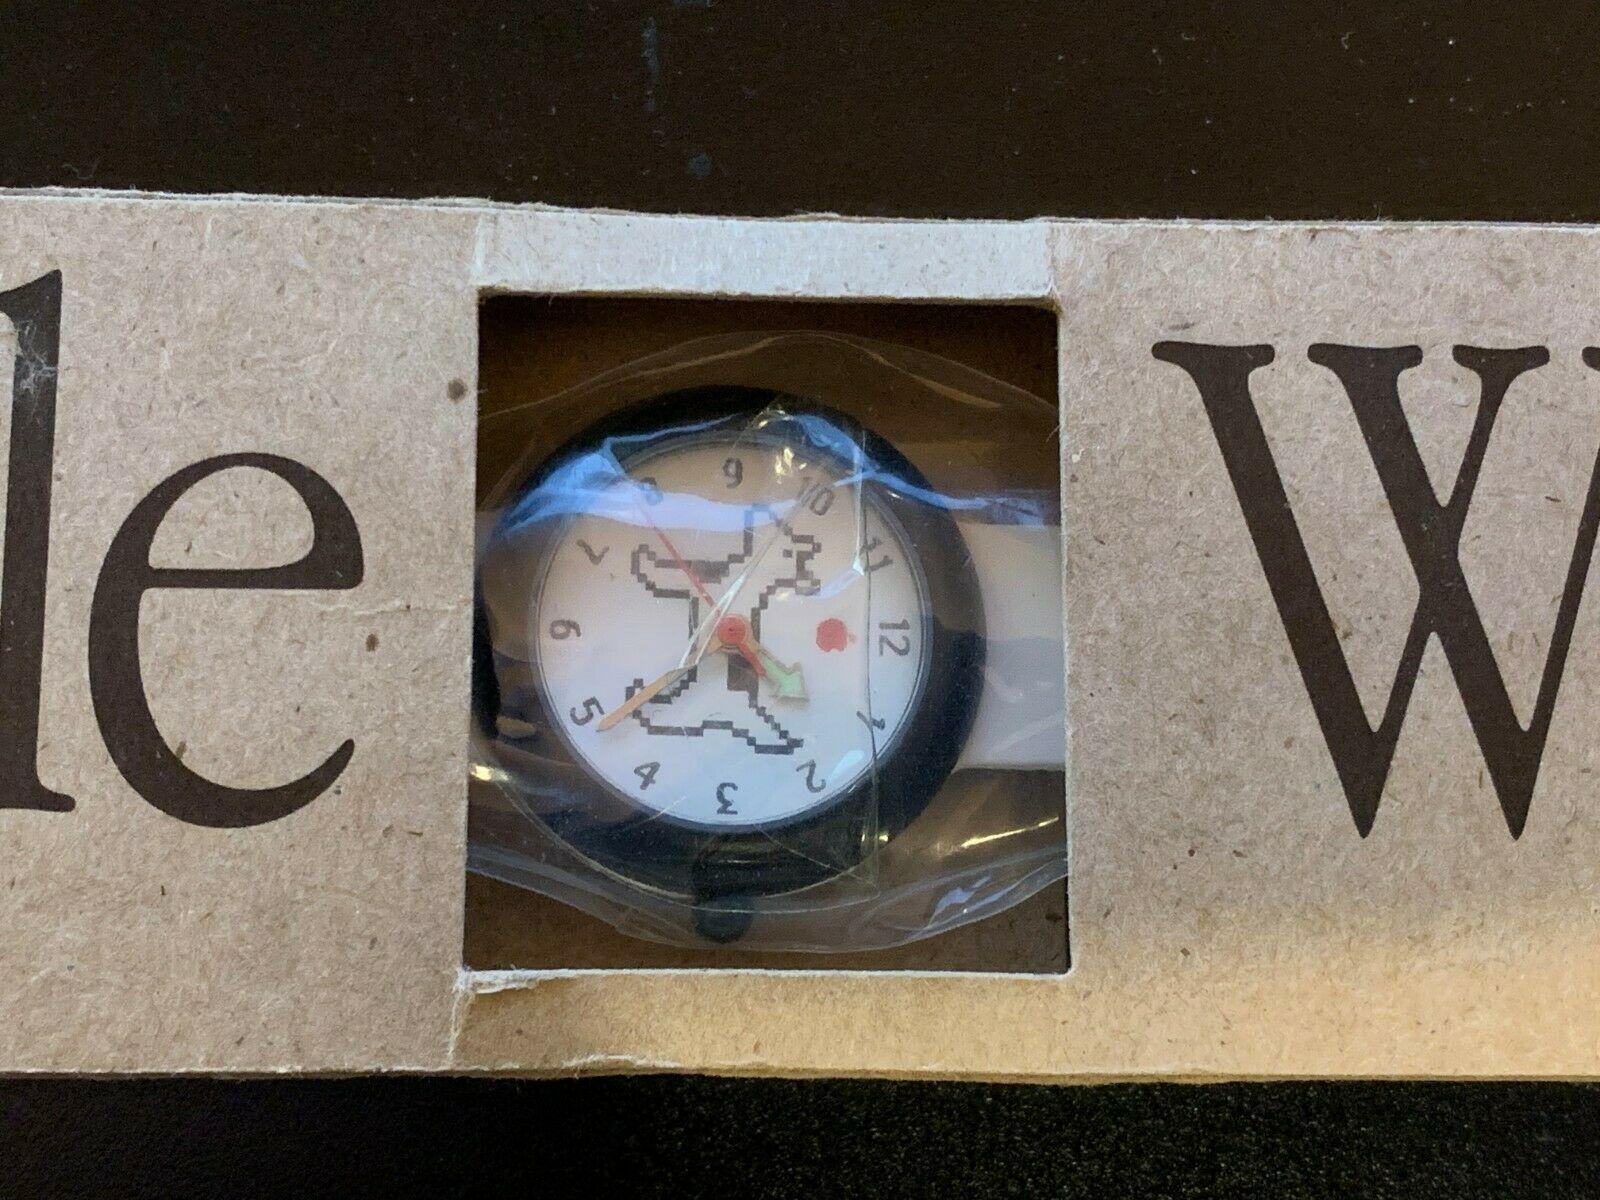 Clarus Watch on eBay